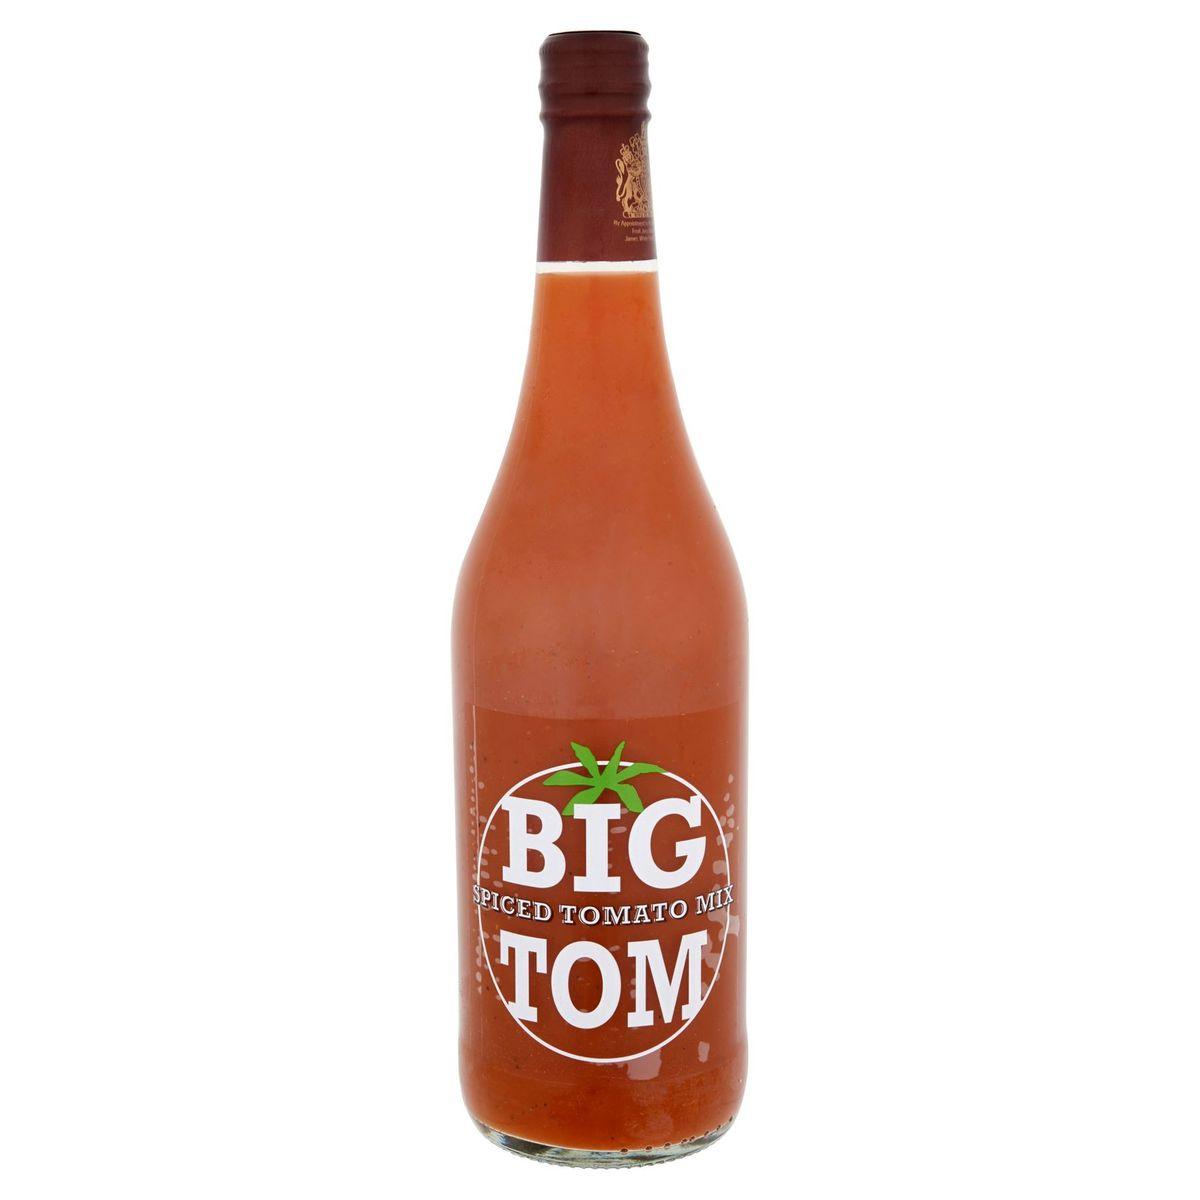 Big Tom Spiced Tomato Mix 75 cl